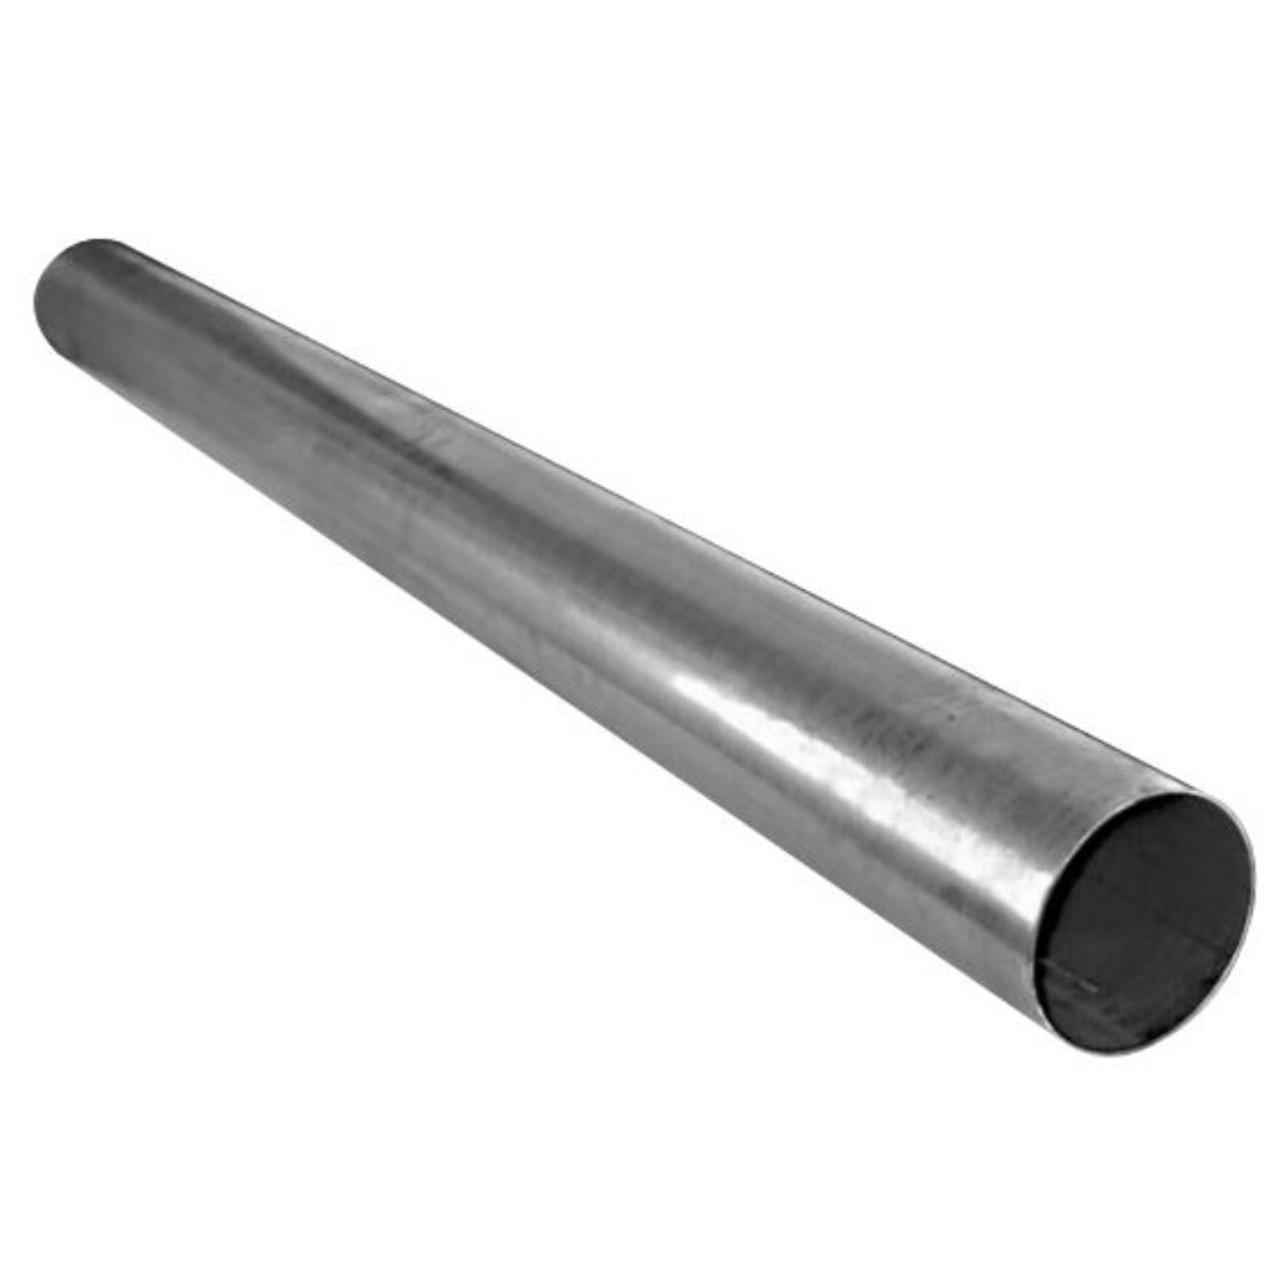 12 x 120 14ga straight mild steel generator exhaust tubing 10 12